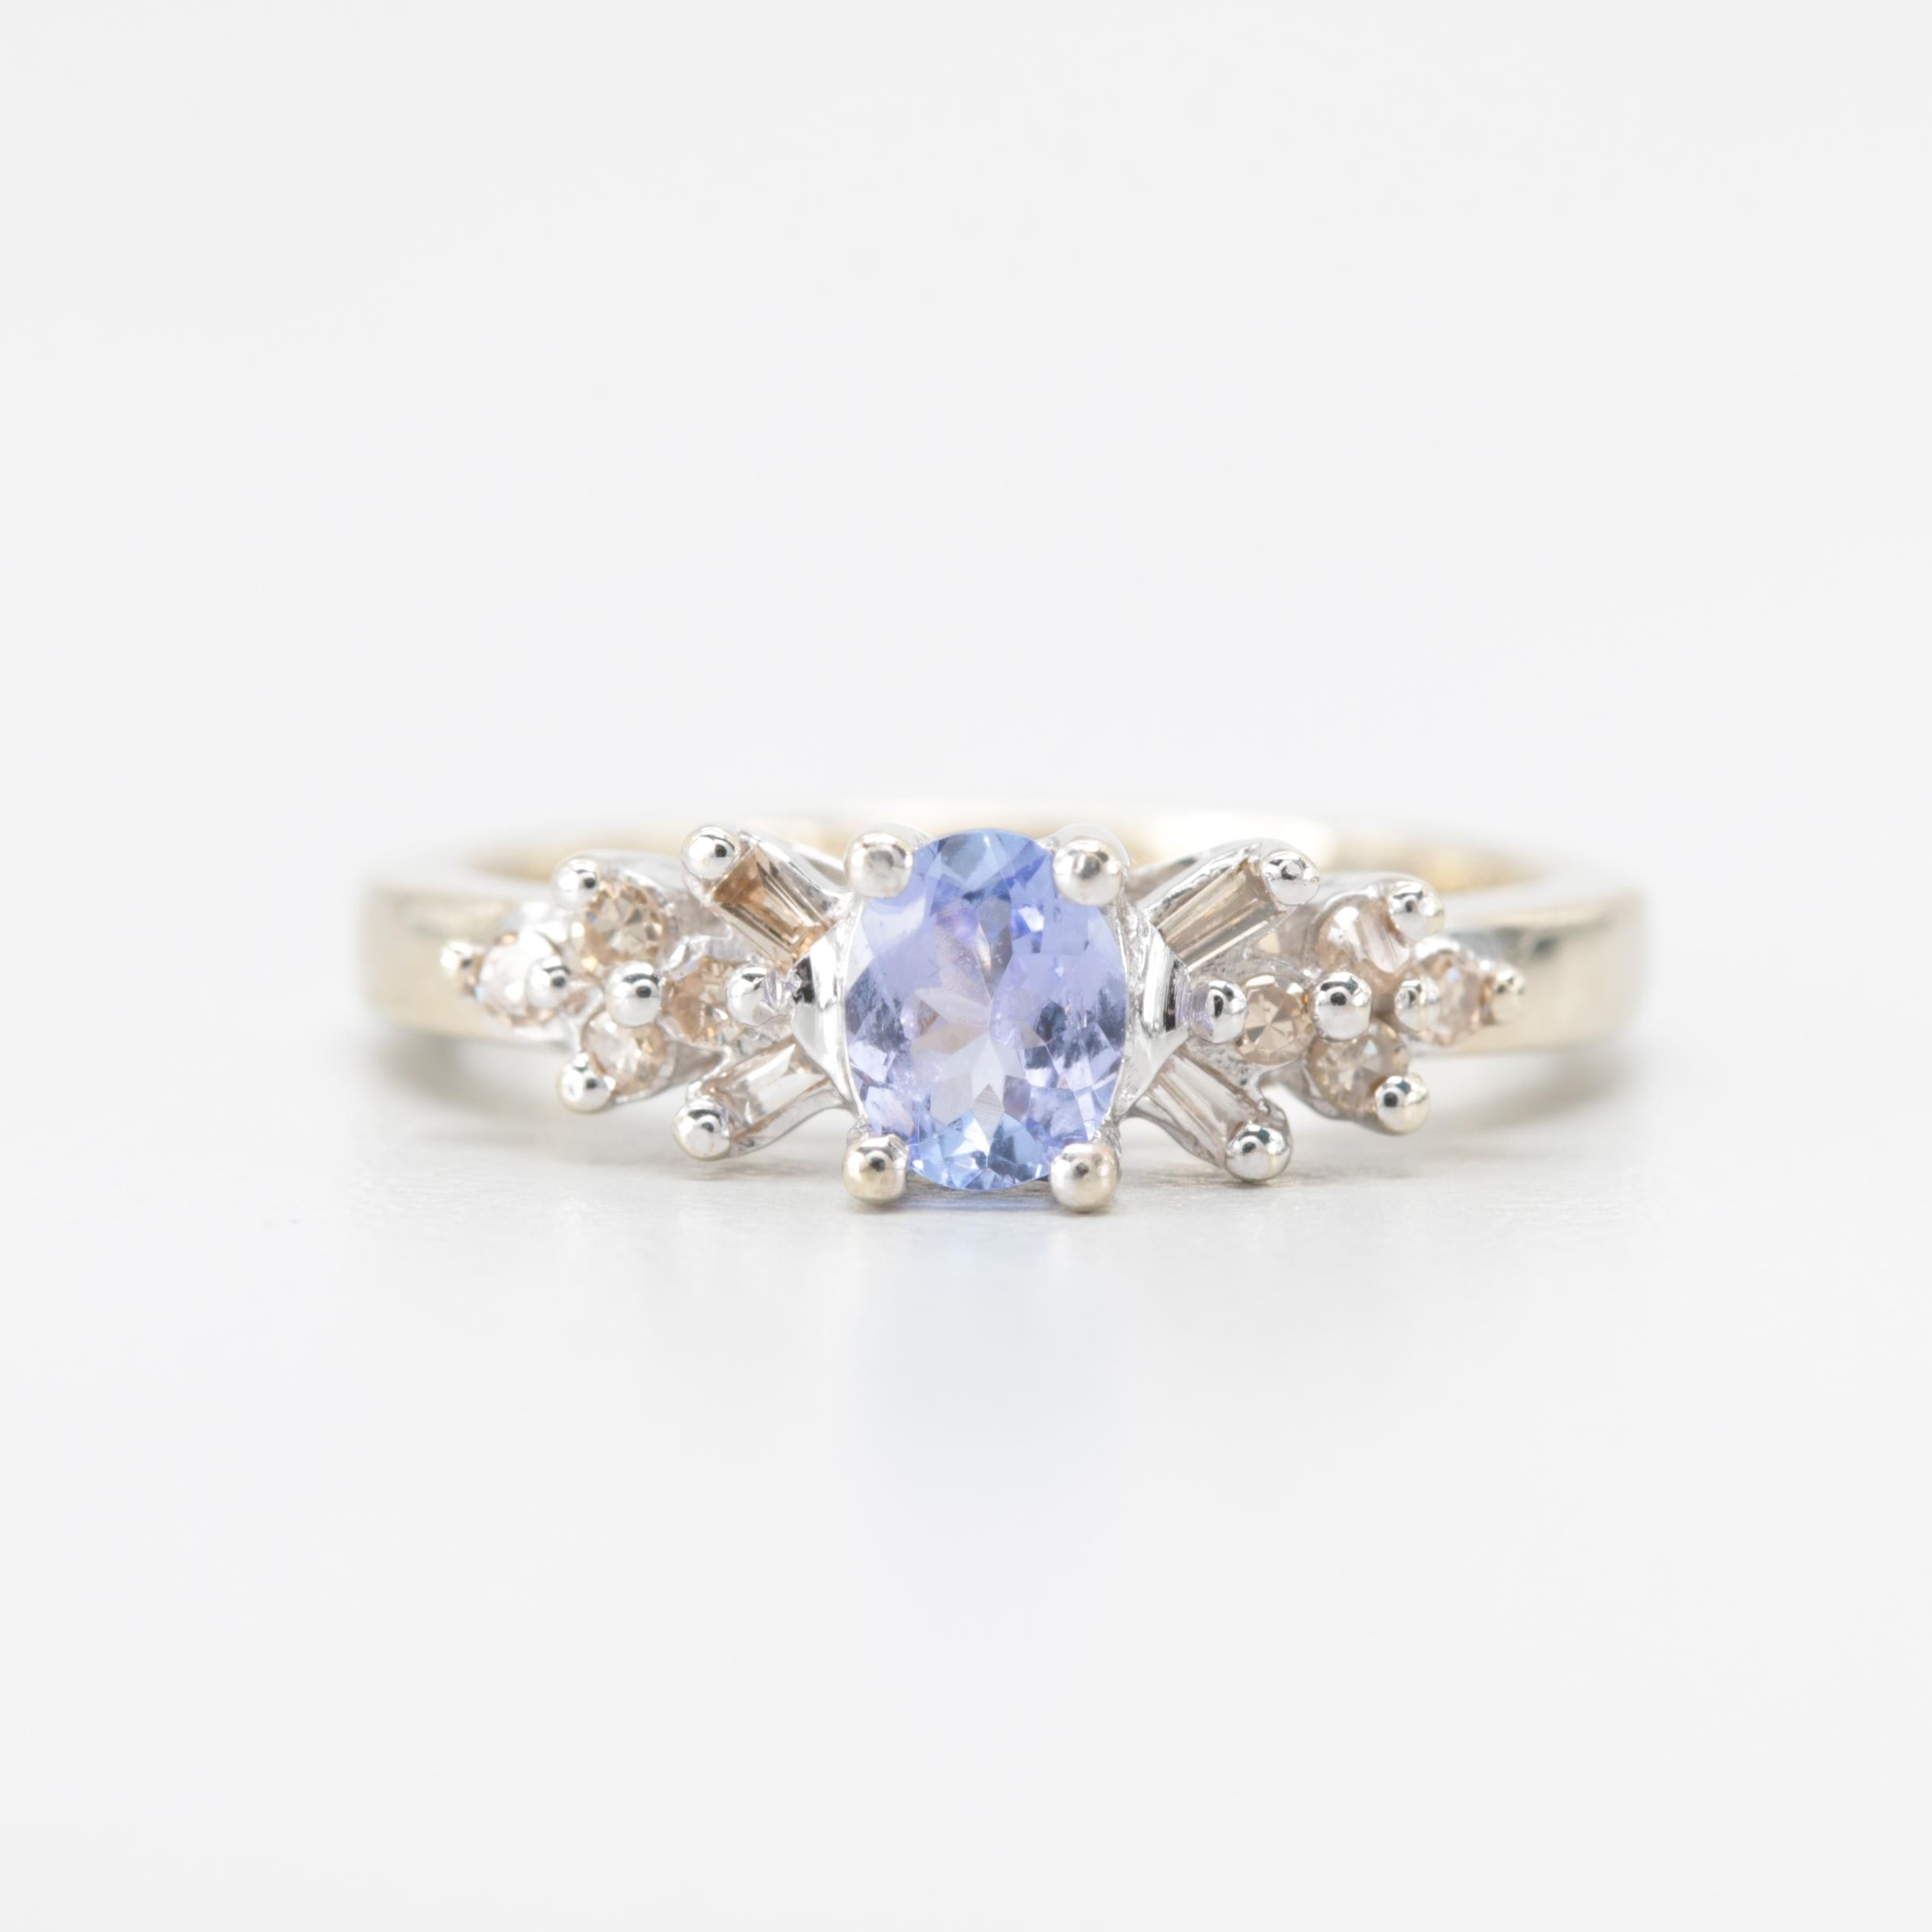 10K White Gold Tanzanite and Diamond Ring